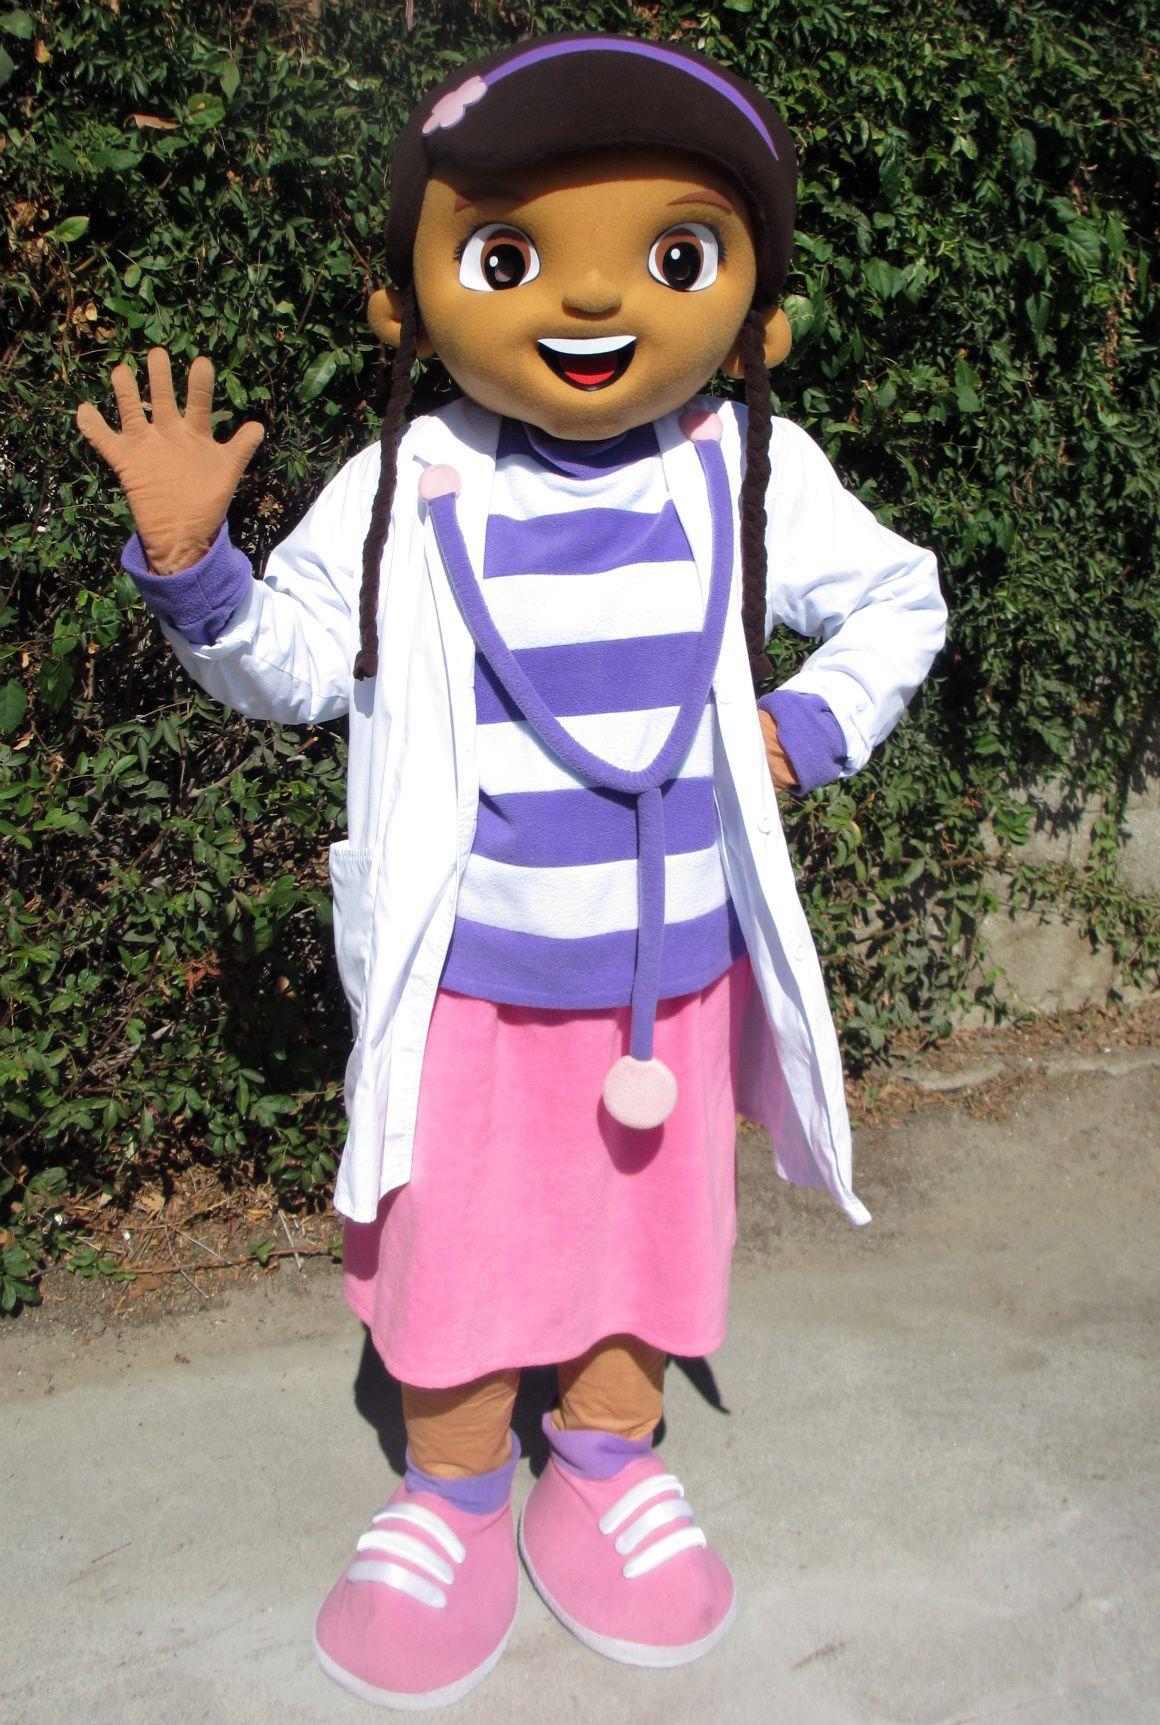 Hallie Doc Mcstuffins Costume 73676 Loadtve